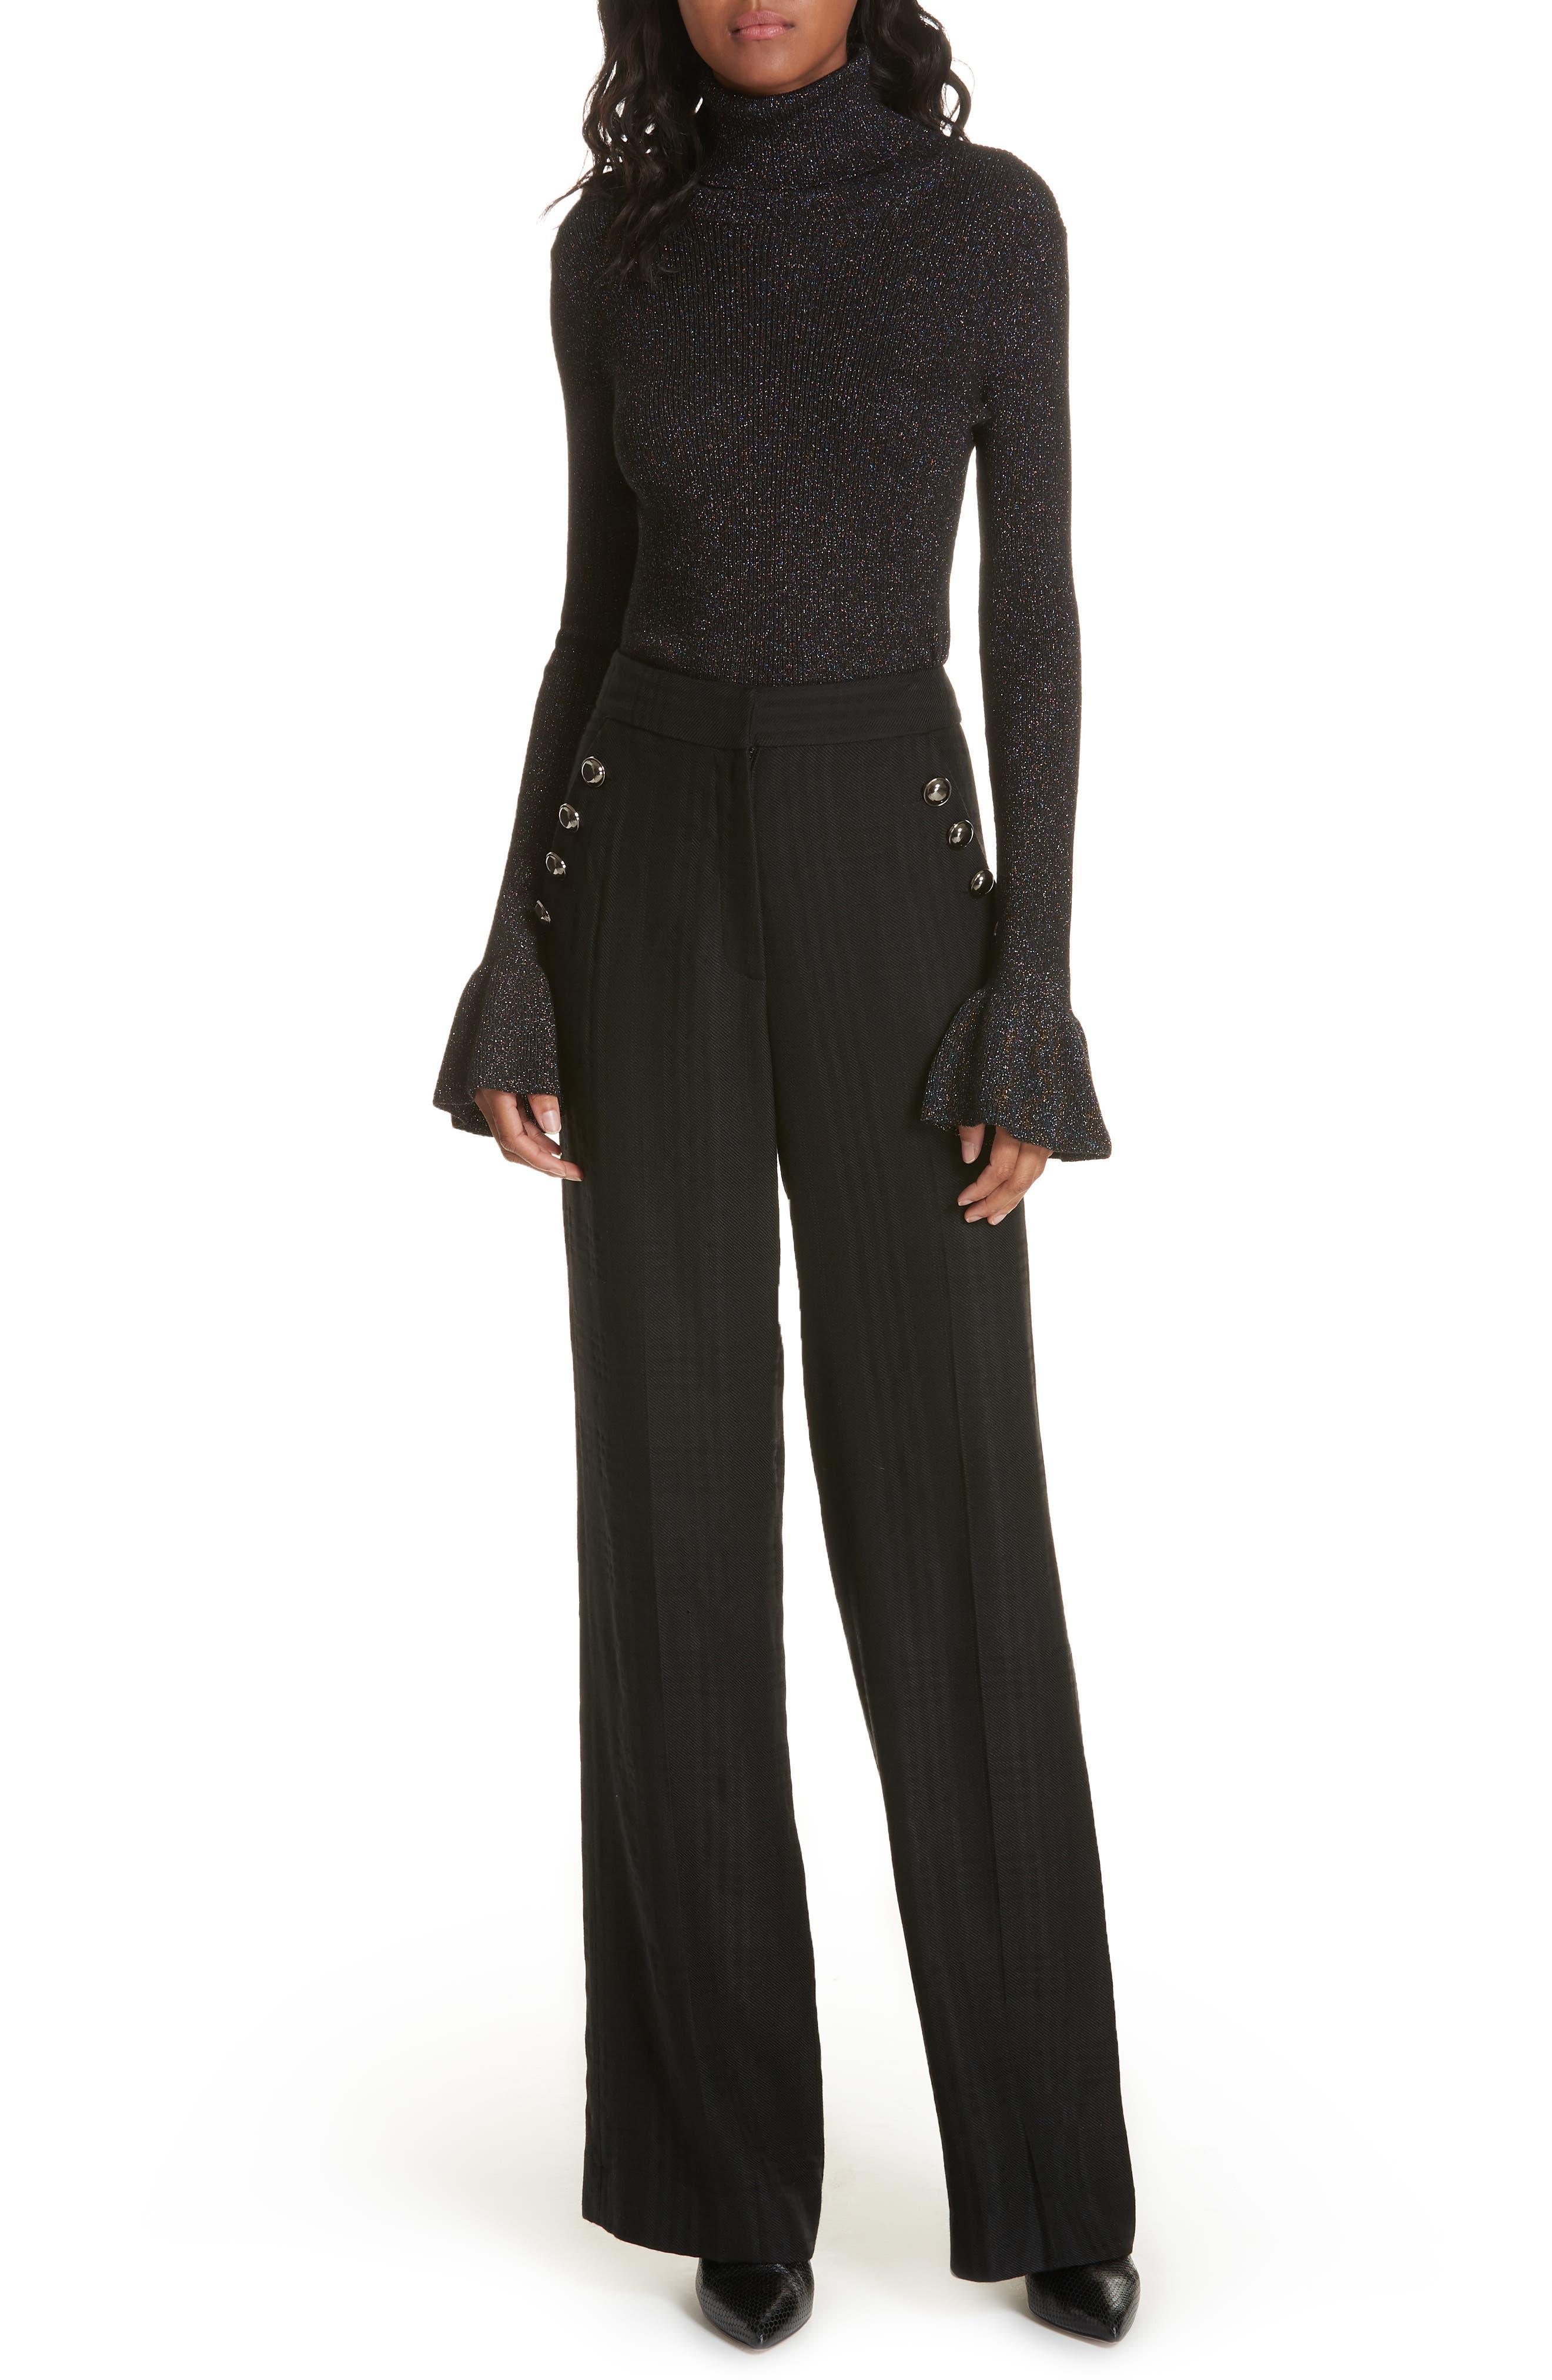 Tuli Check Button Detail Pants,                             Alternate thumbnail 7, color,                             BLACK/ BLACK